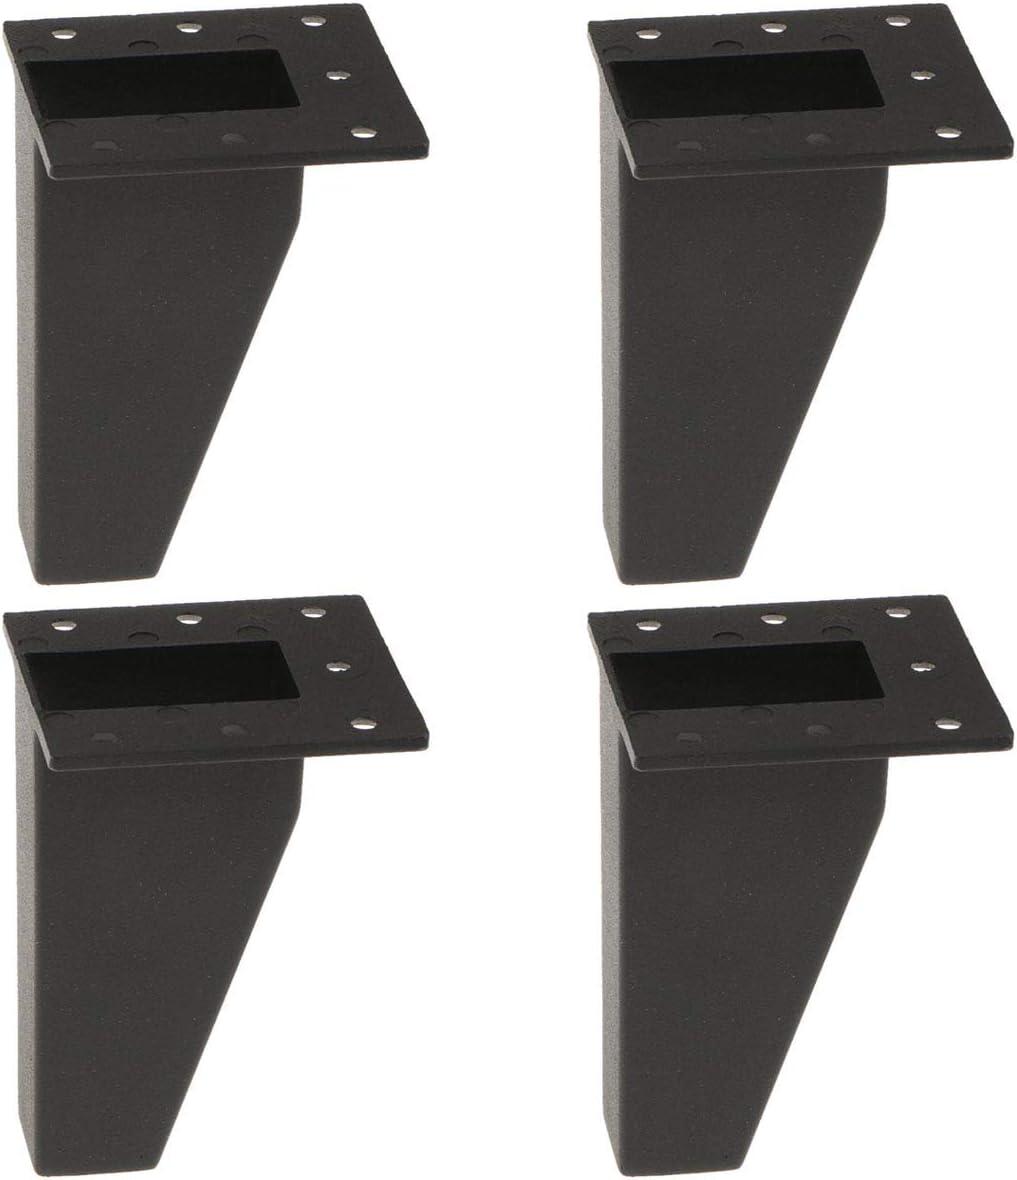 4 inch / 10cm Furniture Legs, La Vane Set of 4 Aluminium Metal Oblique Furniture Feet Black for Cabinet Cupboard Sofa Table Dresser